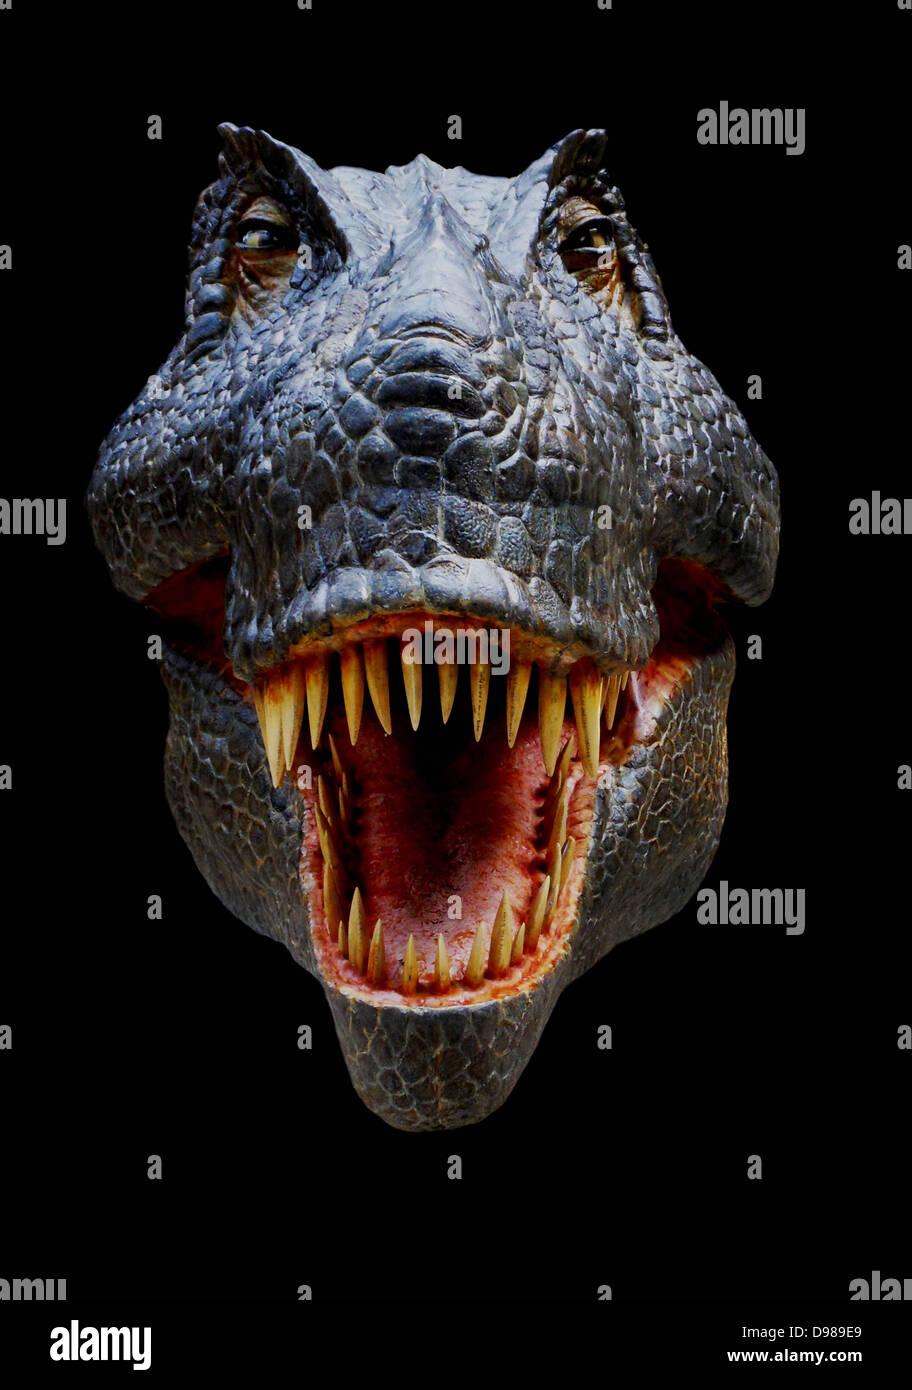 Reconstruction of the head of the Late Cretaceous dinosaur Tyrannosaurus rex - Stock Image